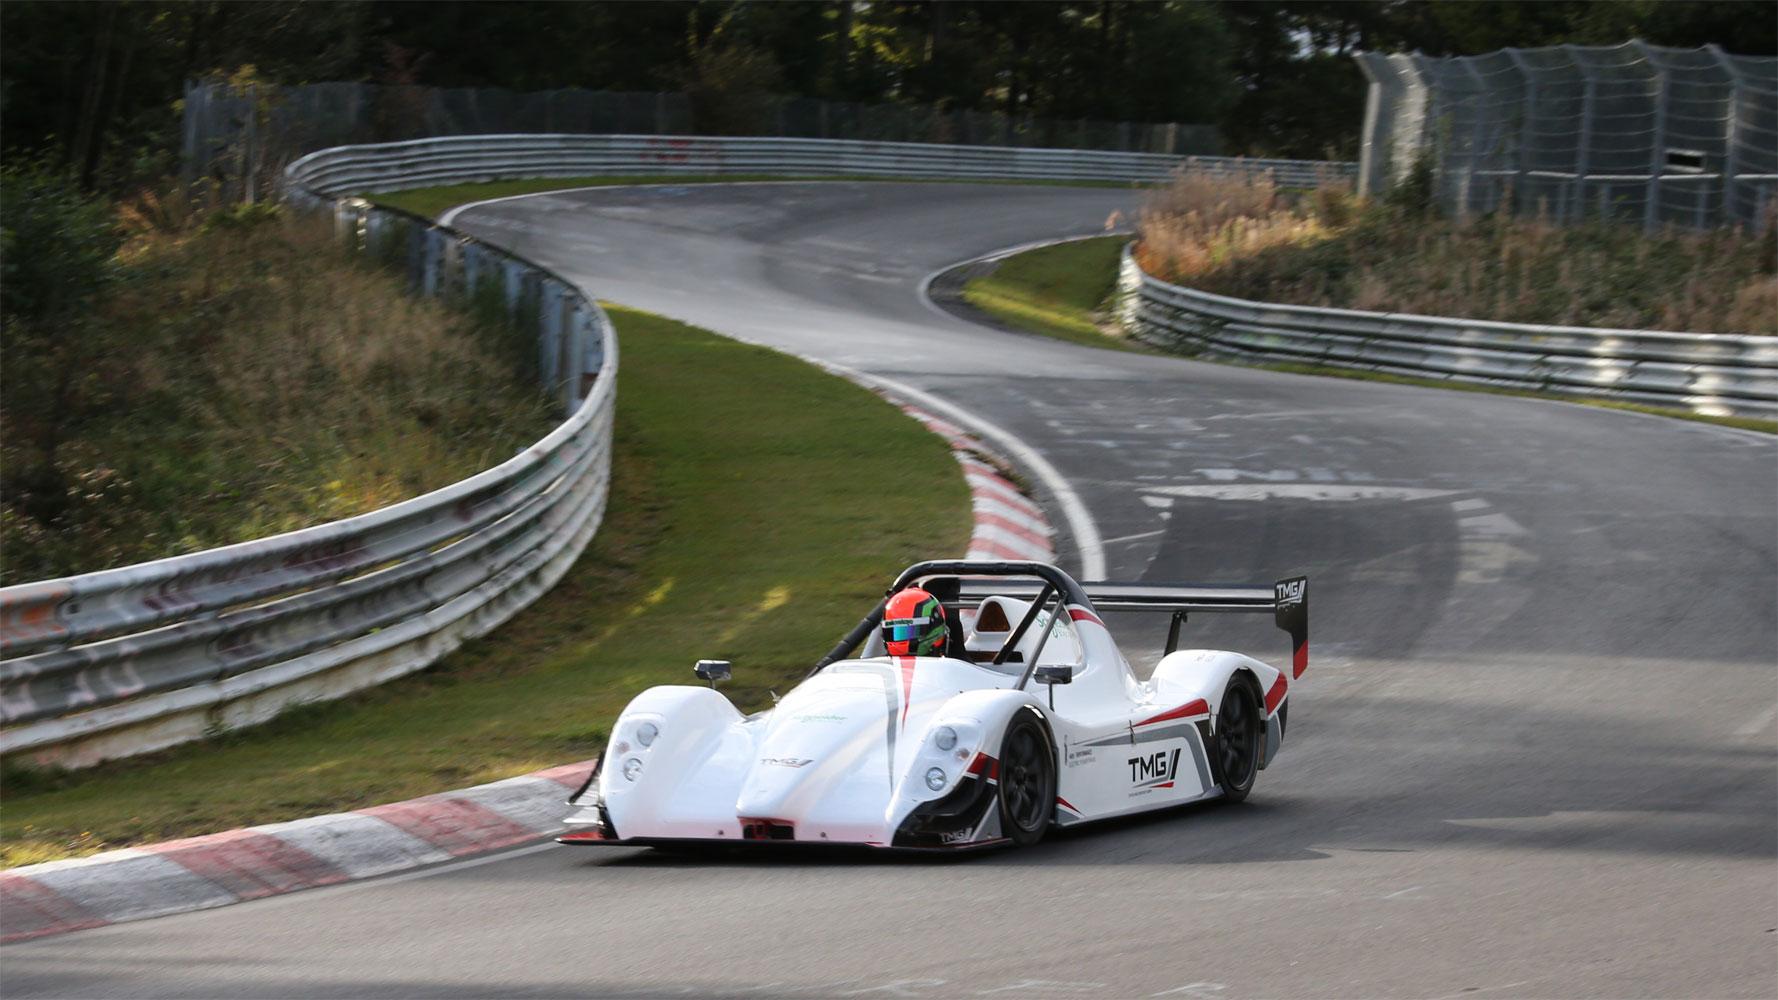 Toyota TMG P002 bricht Nürburgring Rekord – erneut [Video]